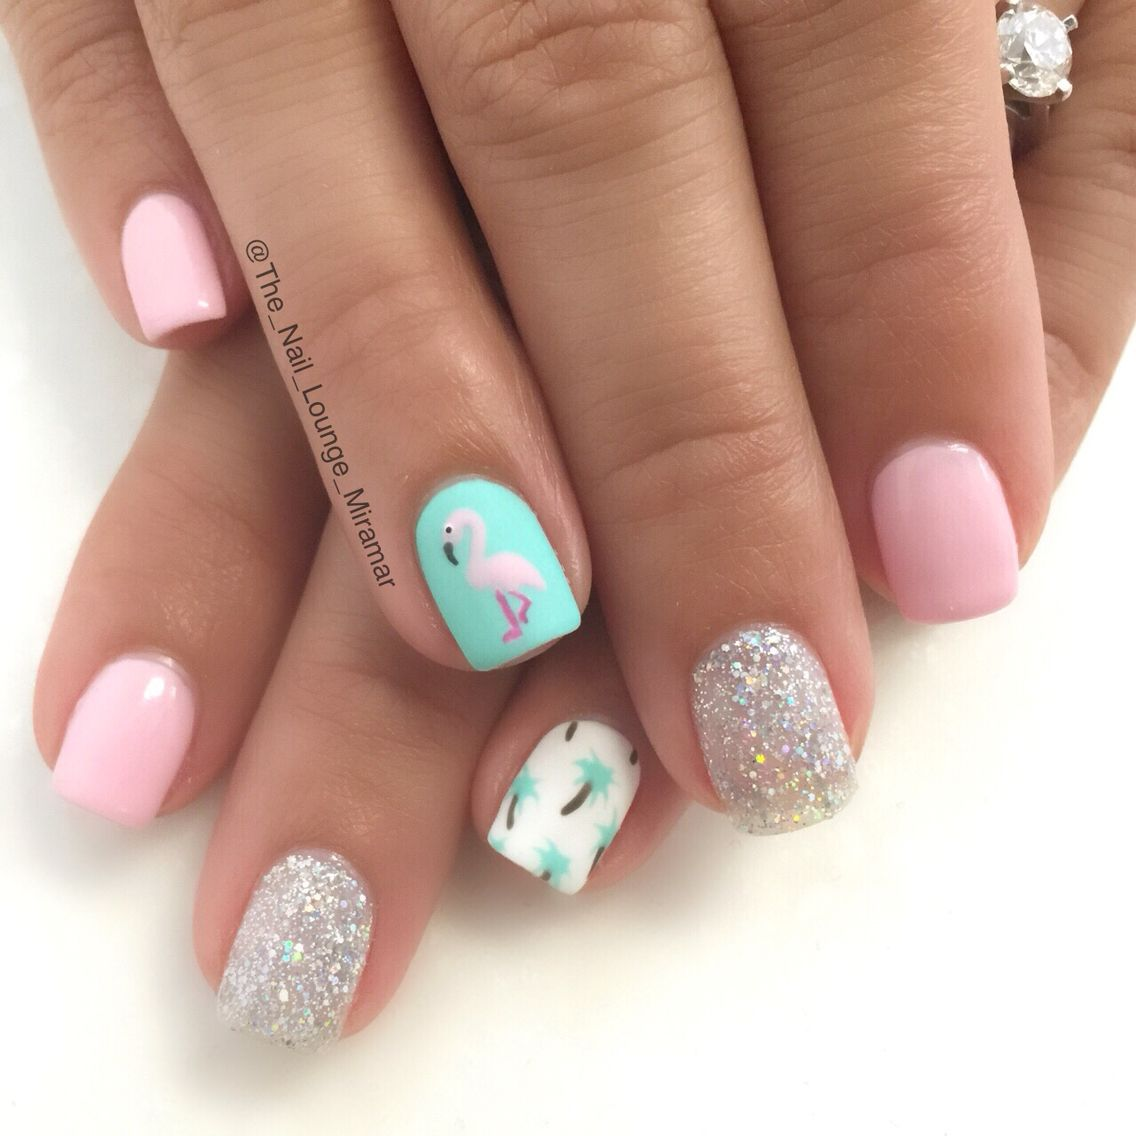 Flamingo palmtrees summer vacation nails inspired by ...